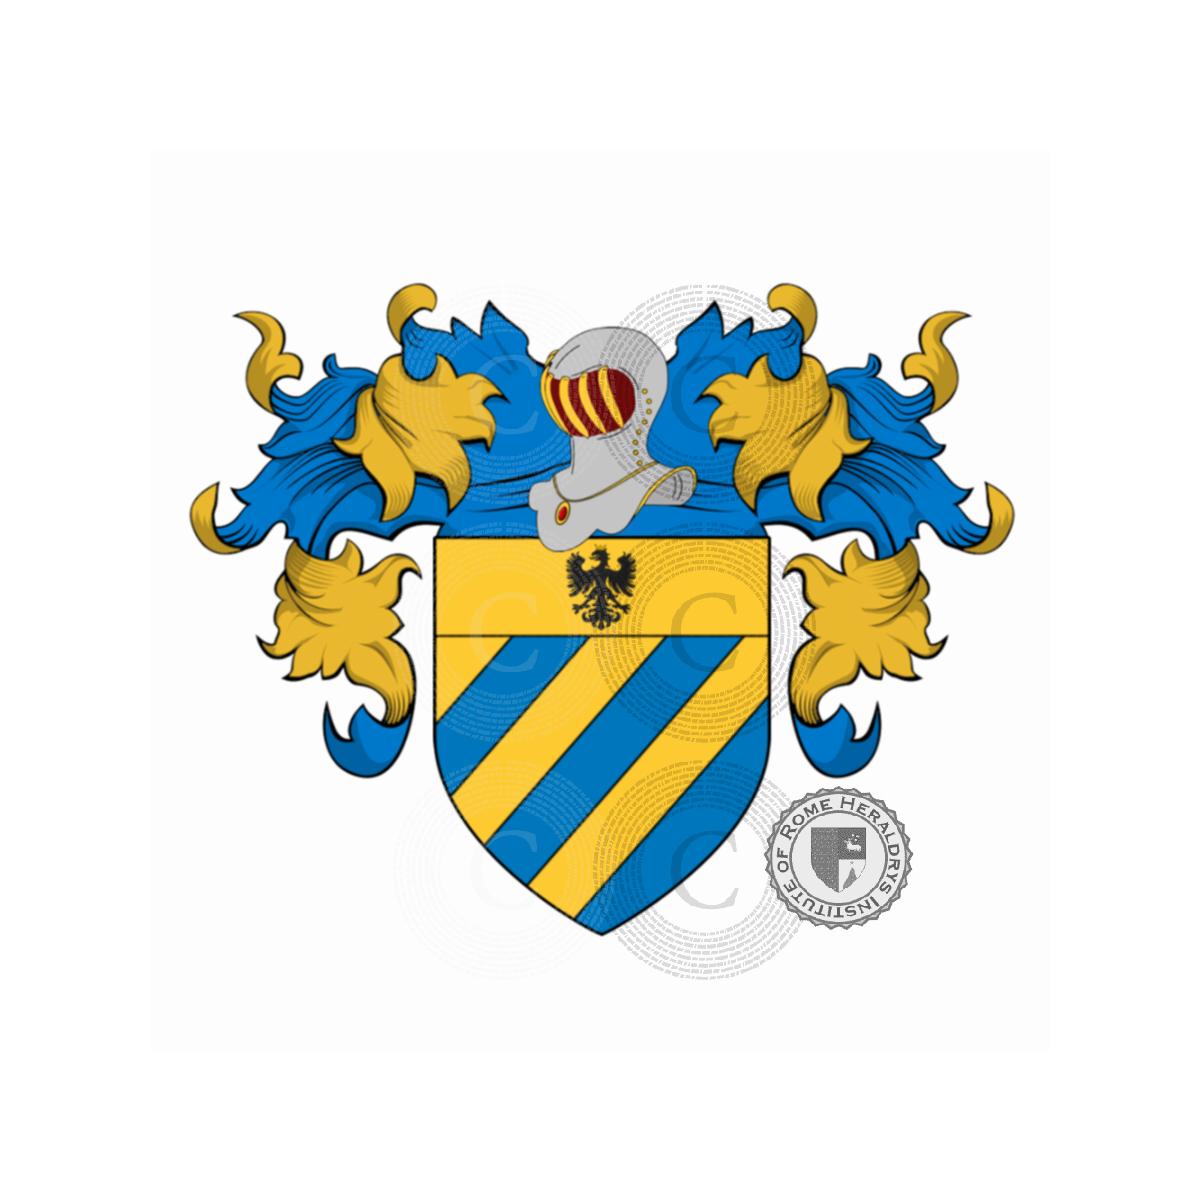 Mantegazza Escudo de armas, Origen Apellido, Heráldica, gen